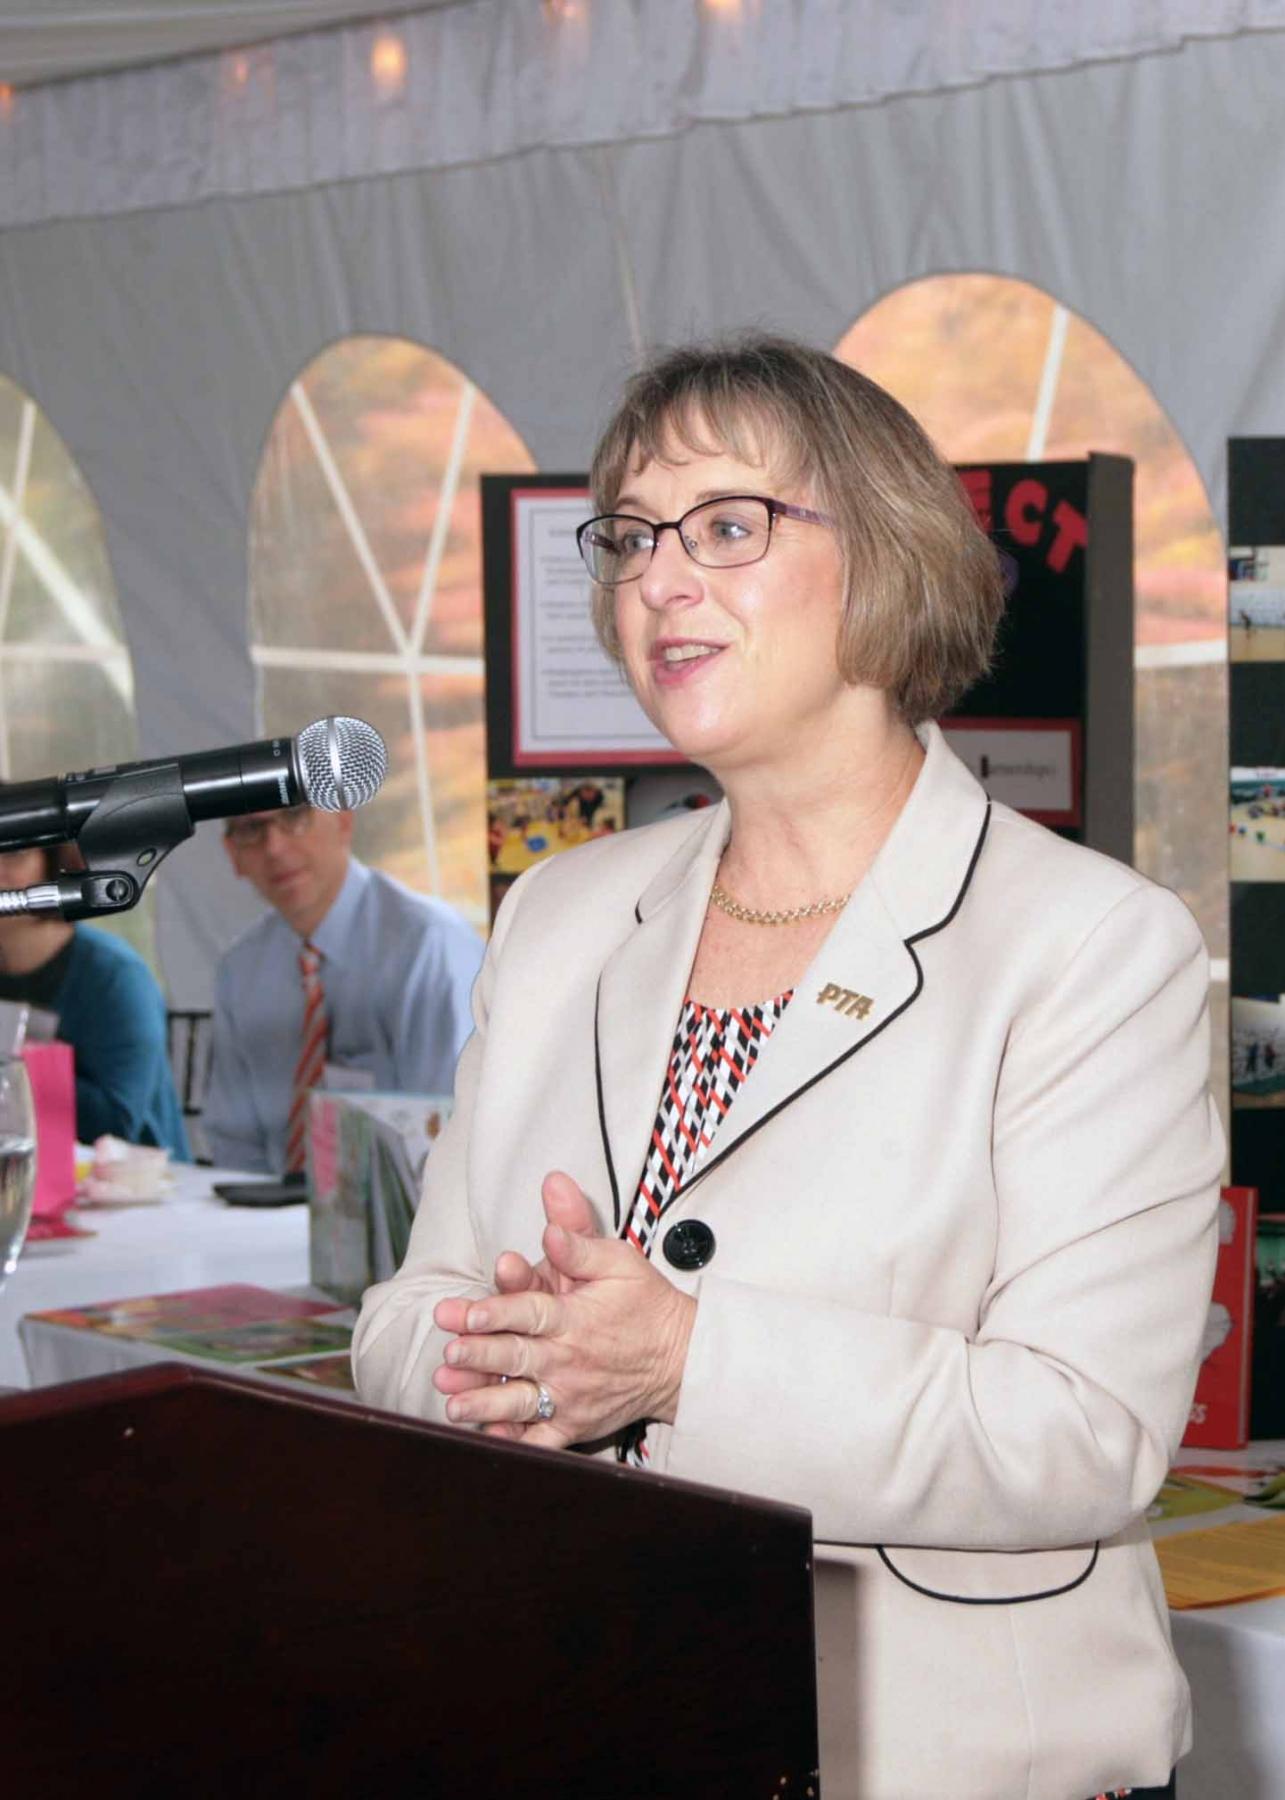 Laura Bay, National PTA President